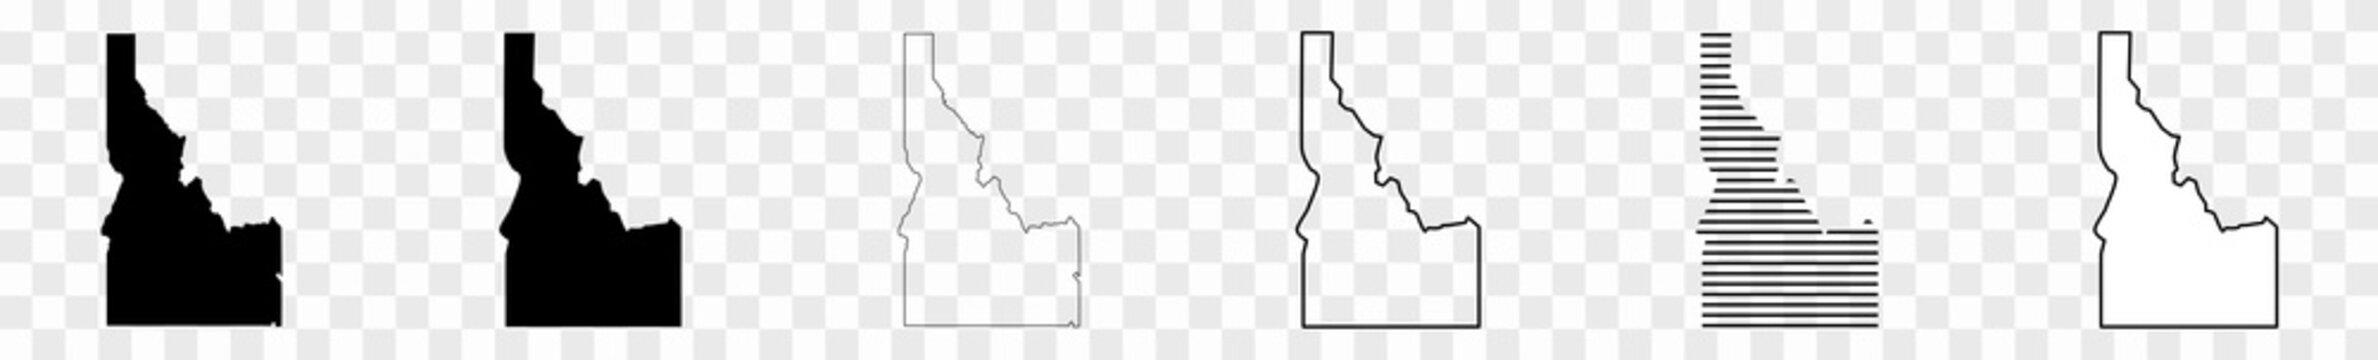 Idaho Map Black | State Border | United States | US America | Transparent Isolated | Variations